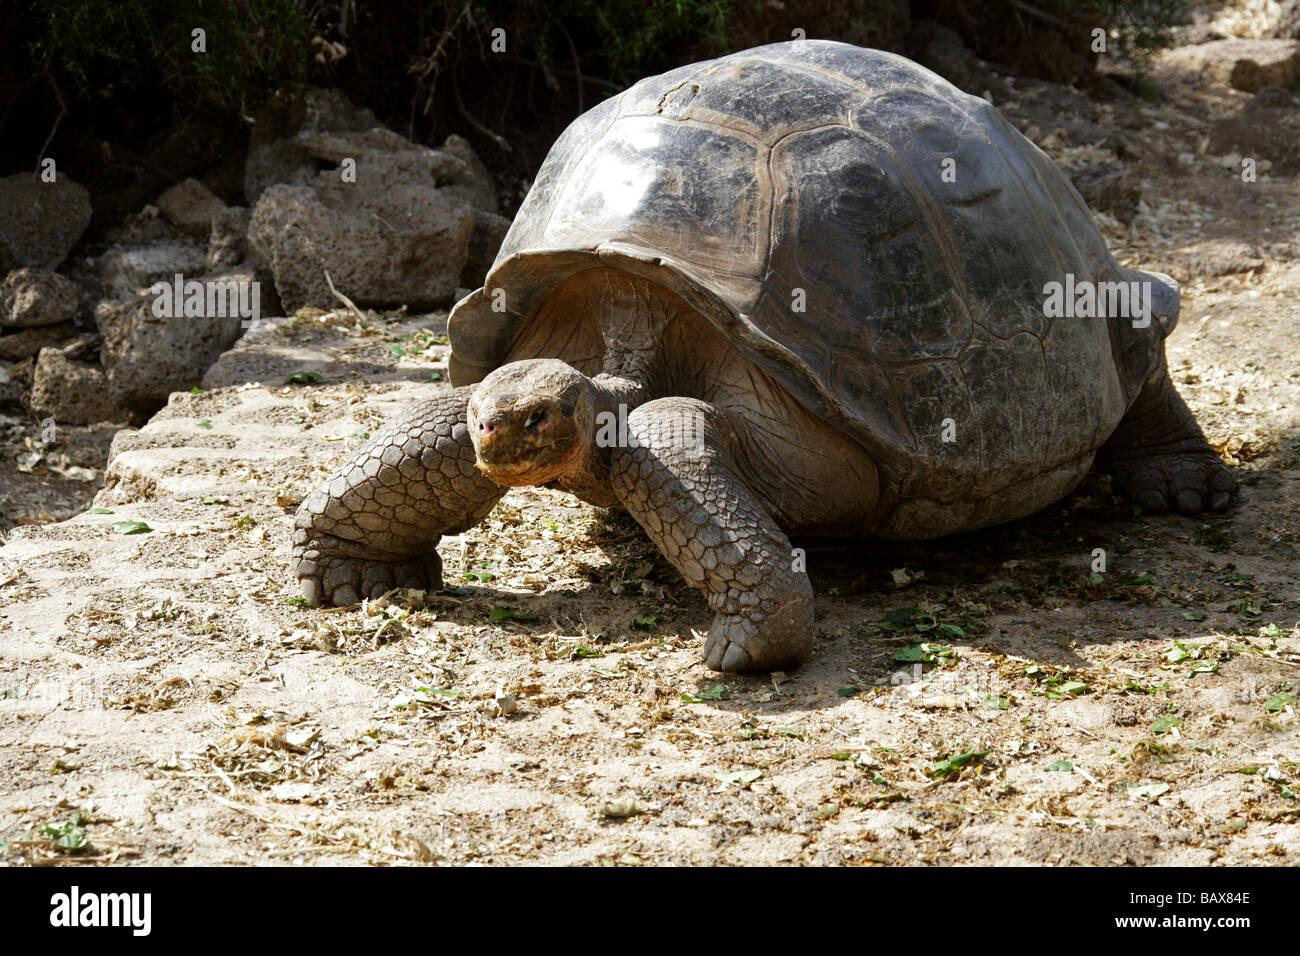 Galapagos Giant Tortoise, Central Isabela Island variation, 'Volcan Alcedo Tortoise', Chelonoidis nigra - Stock Image